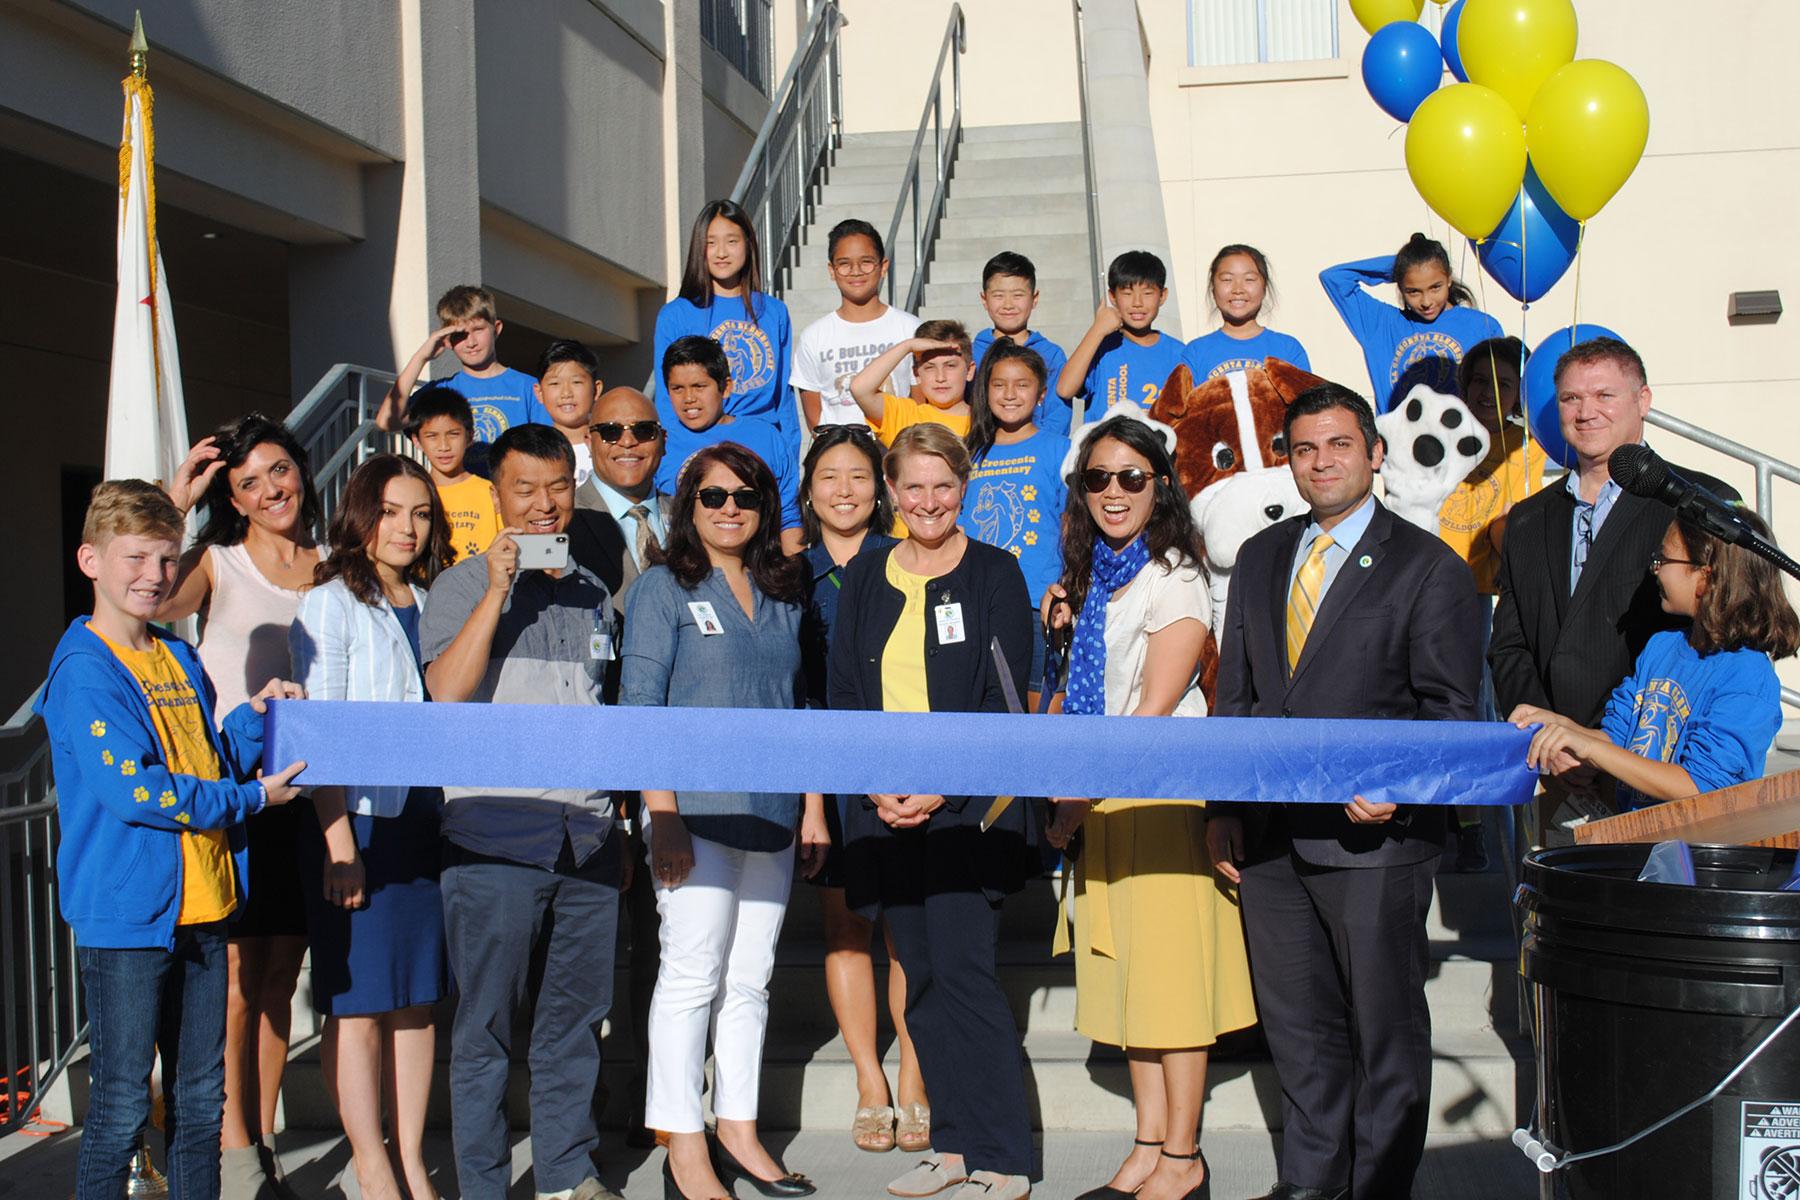 La Crescenta Elementary School Measure S Ribbon Cutting Ceremony November 2018